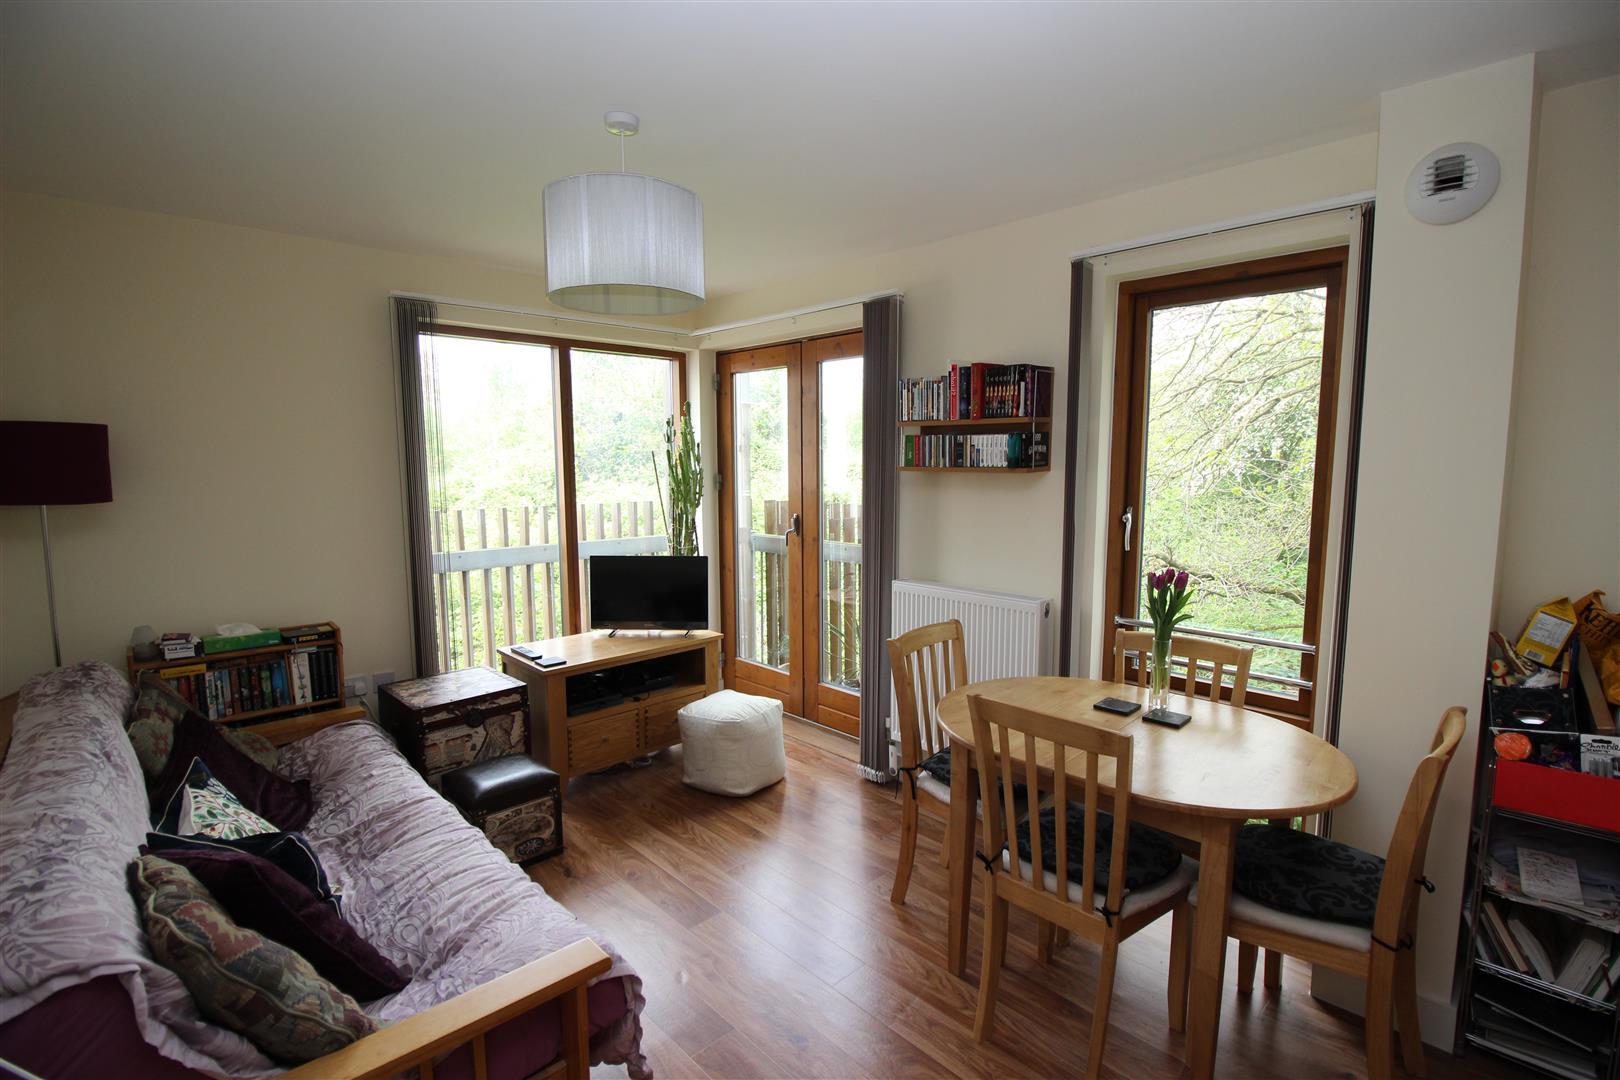 1 Bedroom Property for sale in Cowleaze, Chippenham